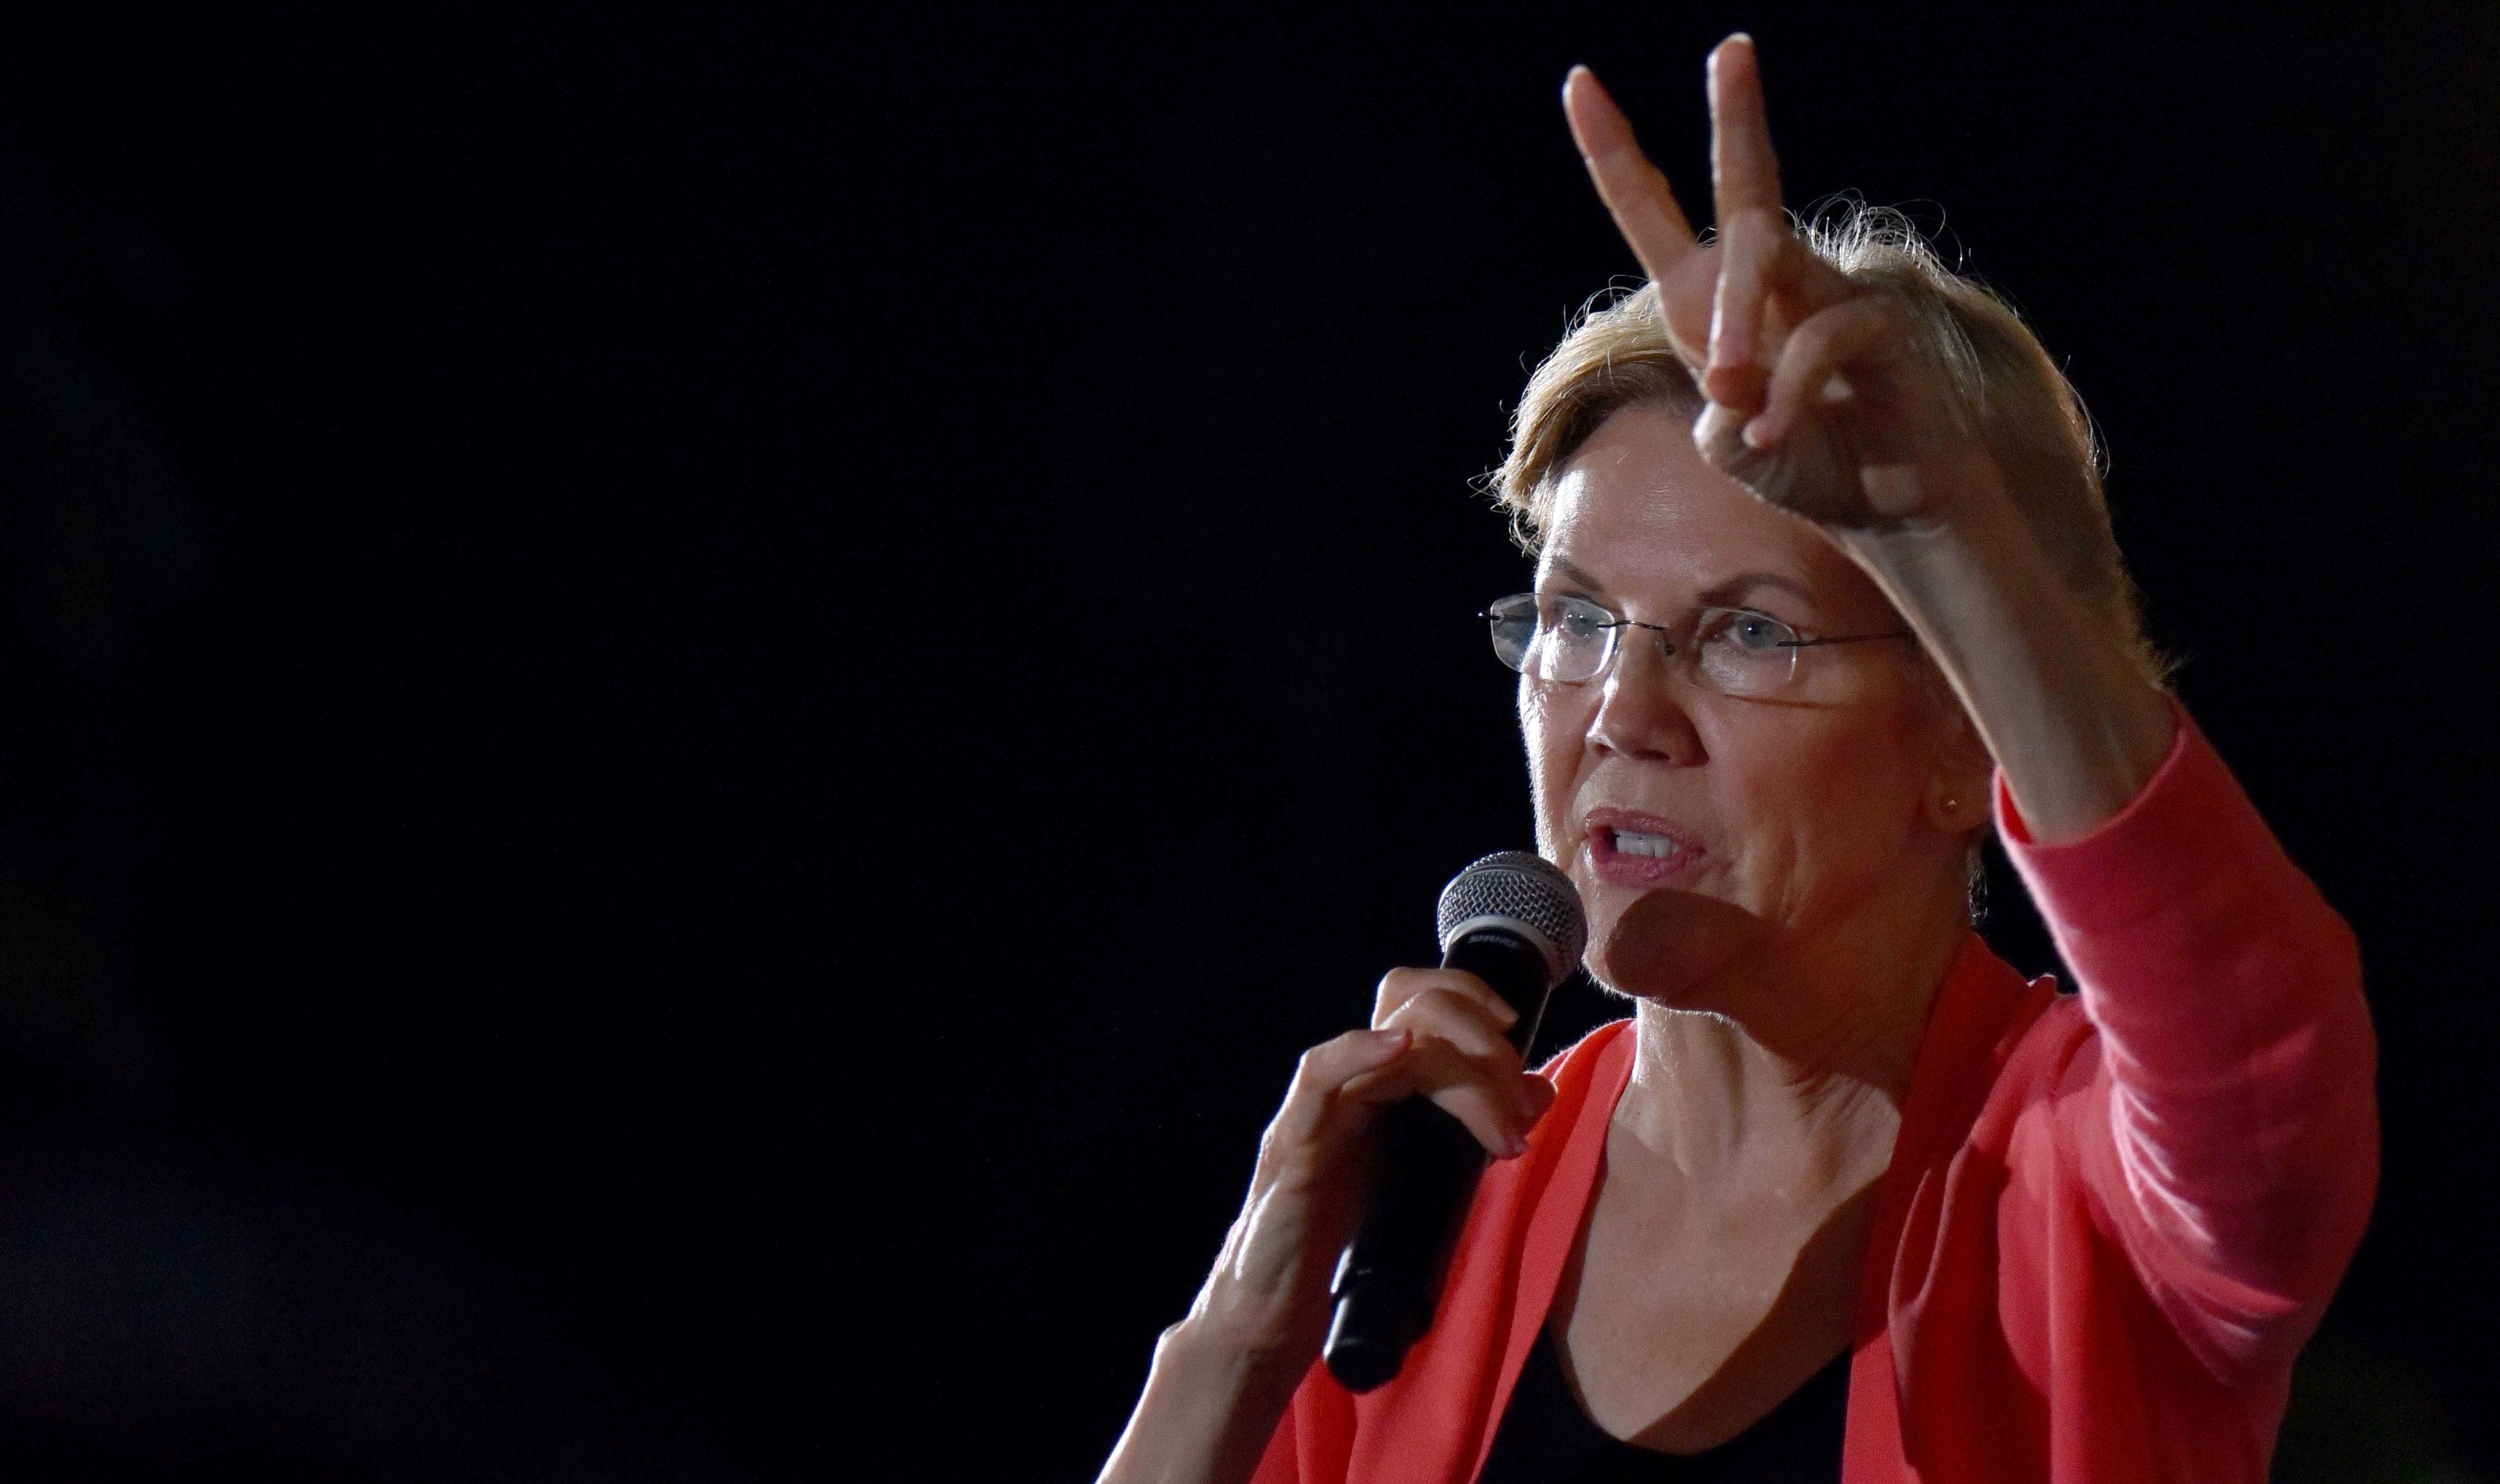 Sen. Elizabeth Warren signals her plan for a 2% wealth tax on every dollar over $50 million.